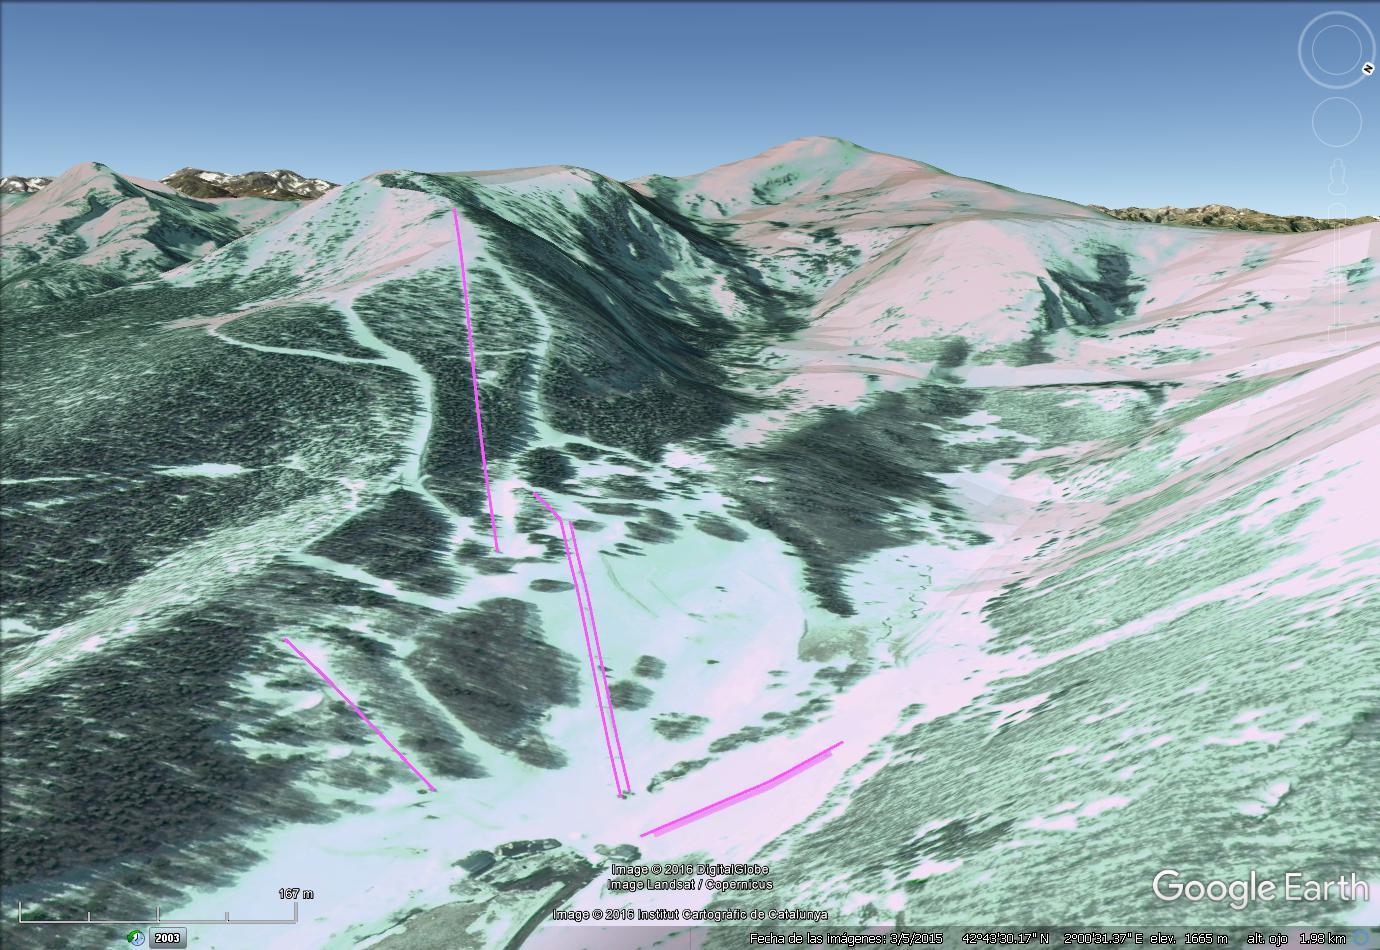 Vistas Google Earth Mijanes 2016-17